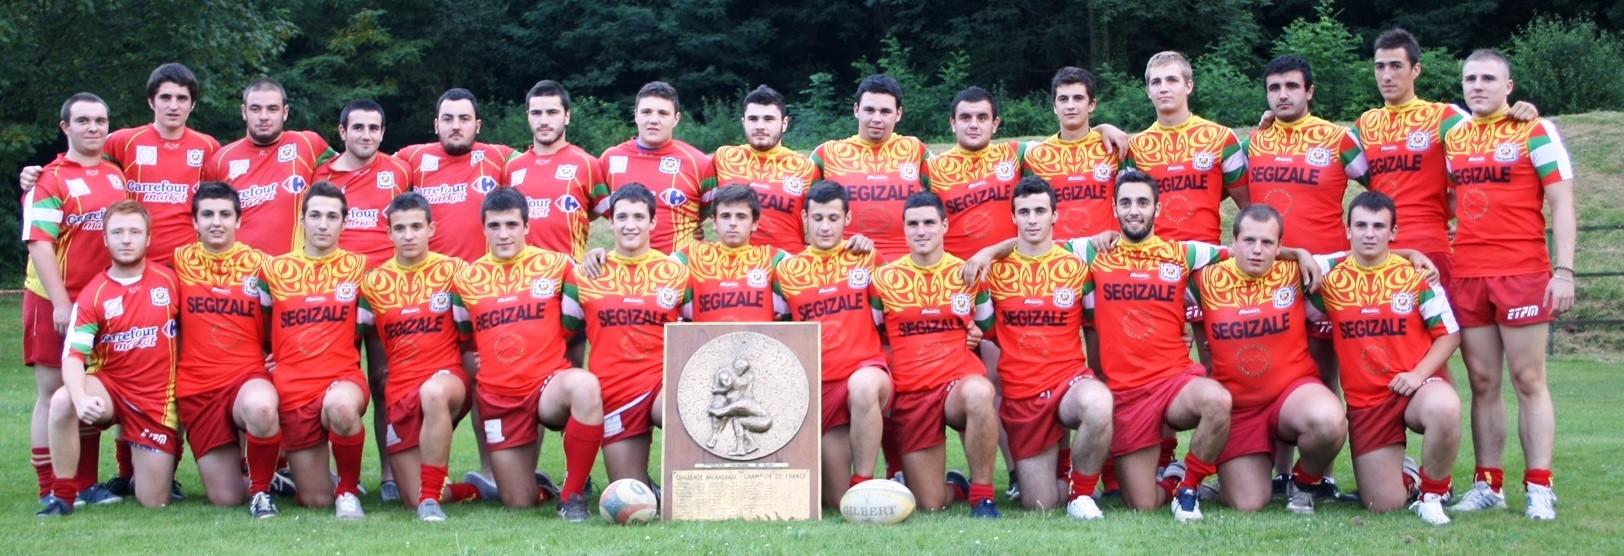 naffaroa champions de france balandrade 2014